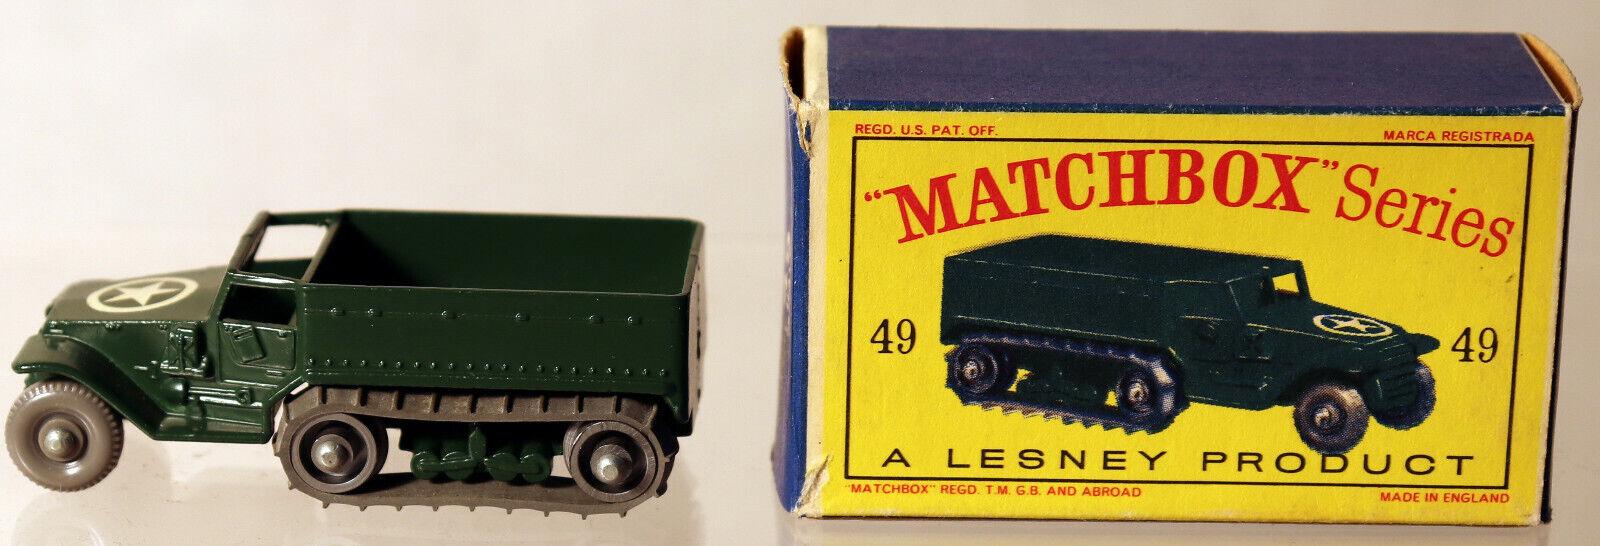 DTE LESNEY MATCHBOX REGULAR WHEELS 49-1 RARE SPR M3 PERSONNEL CARRIER W FINE GPW